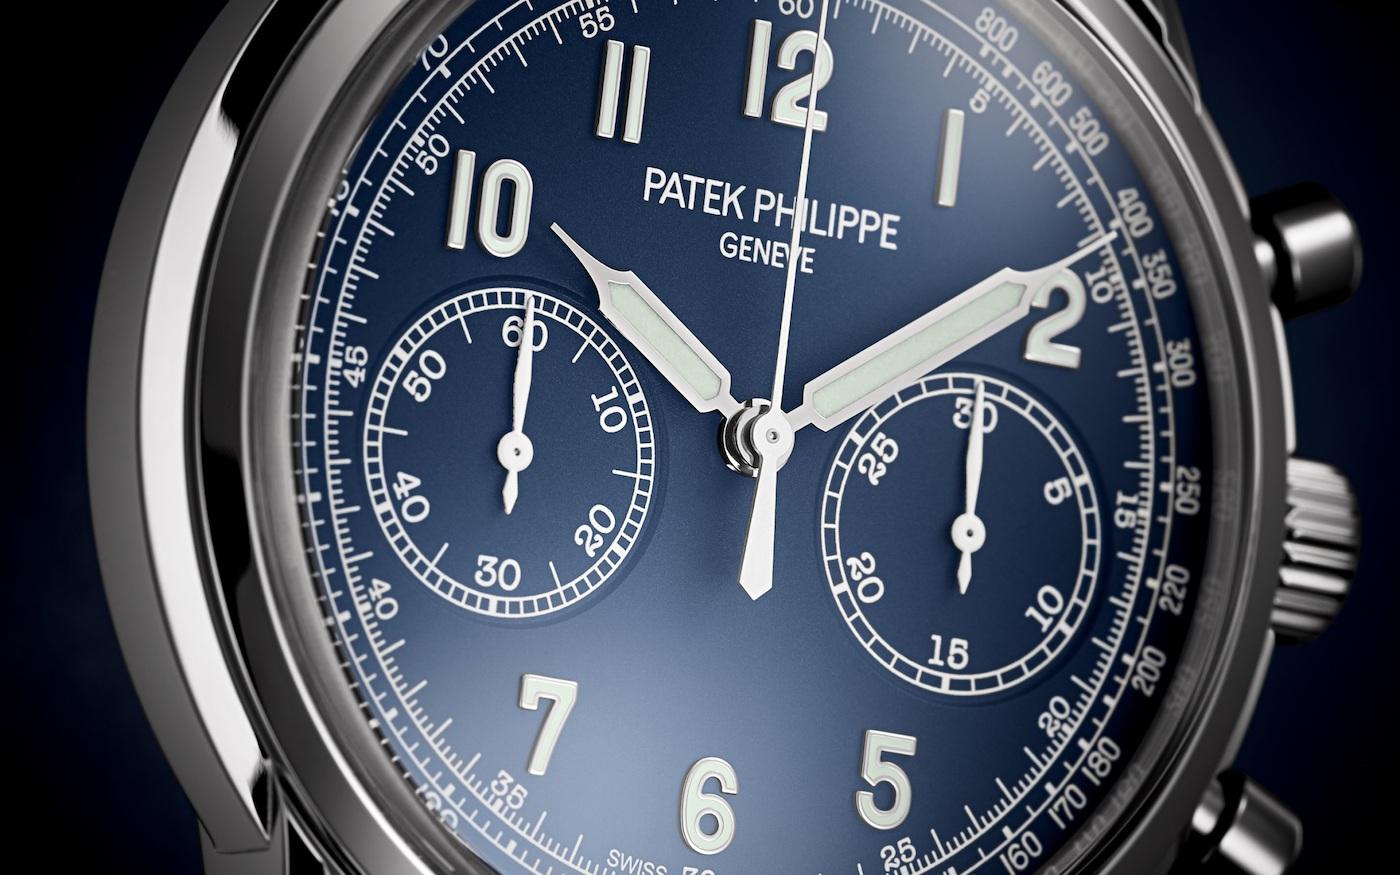 Patek Philippe 5172G Chronograph Replica